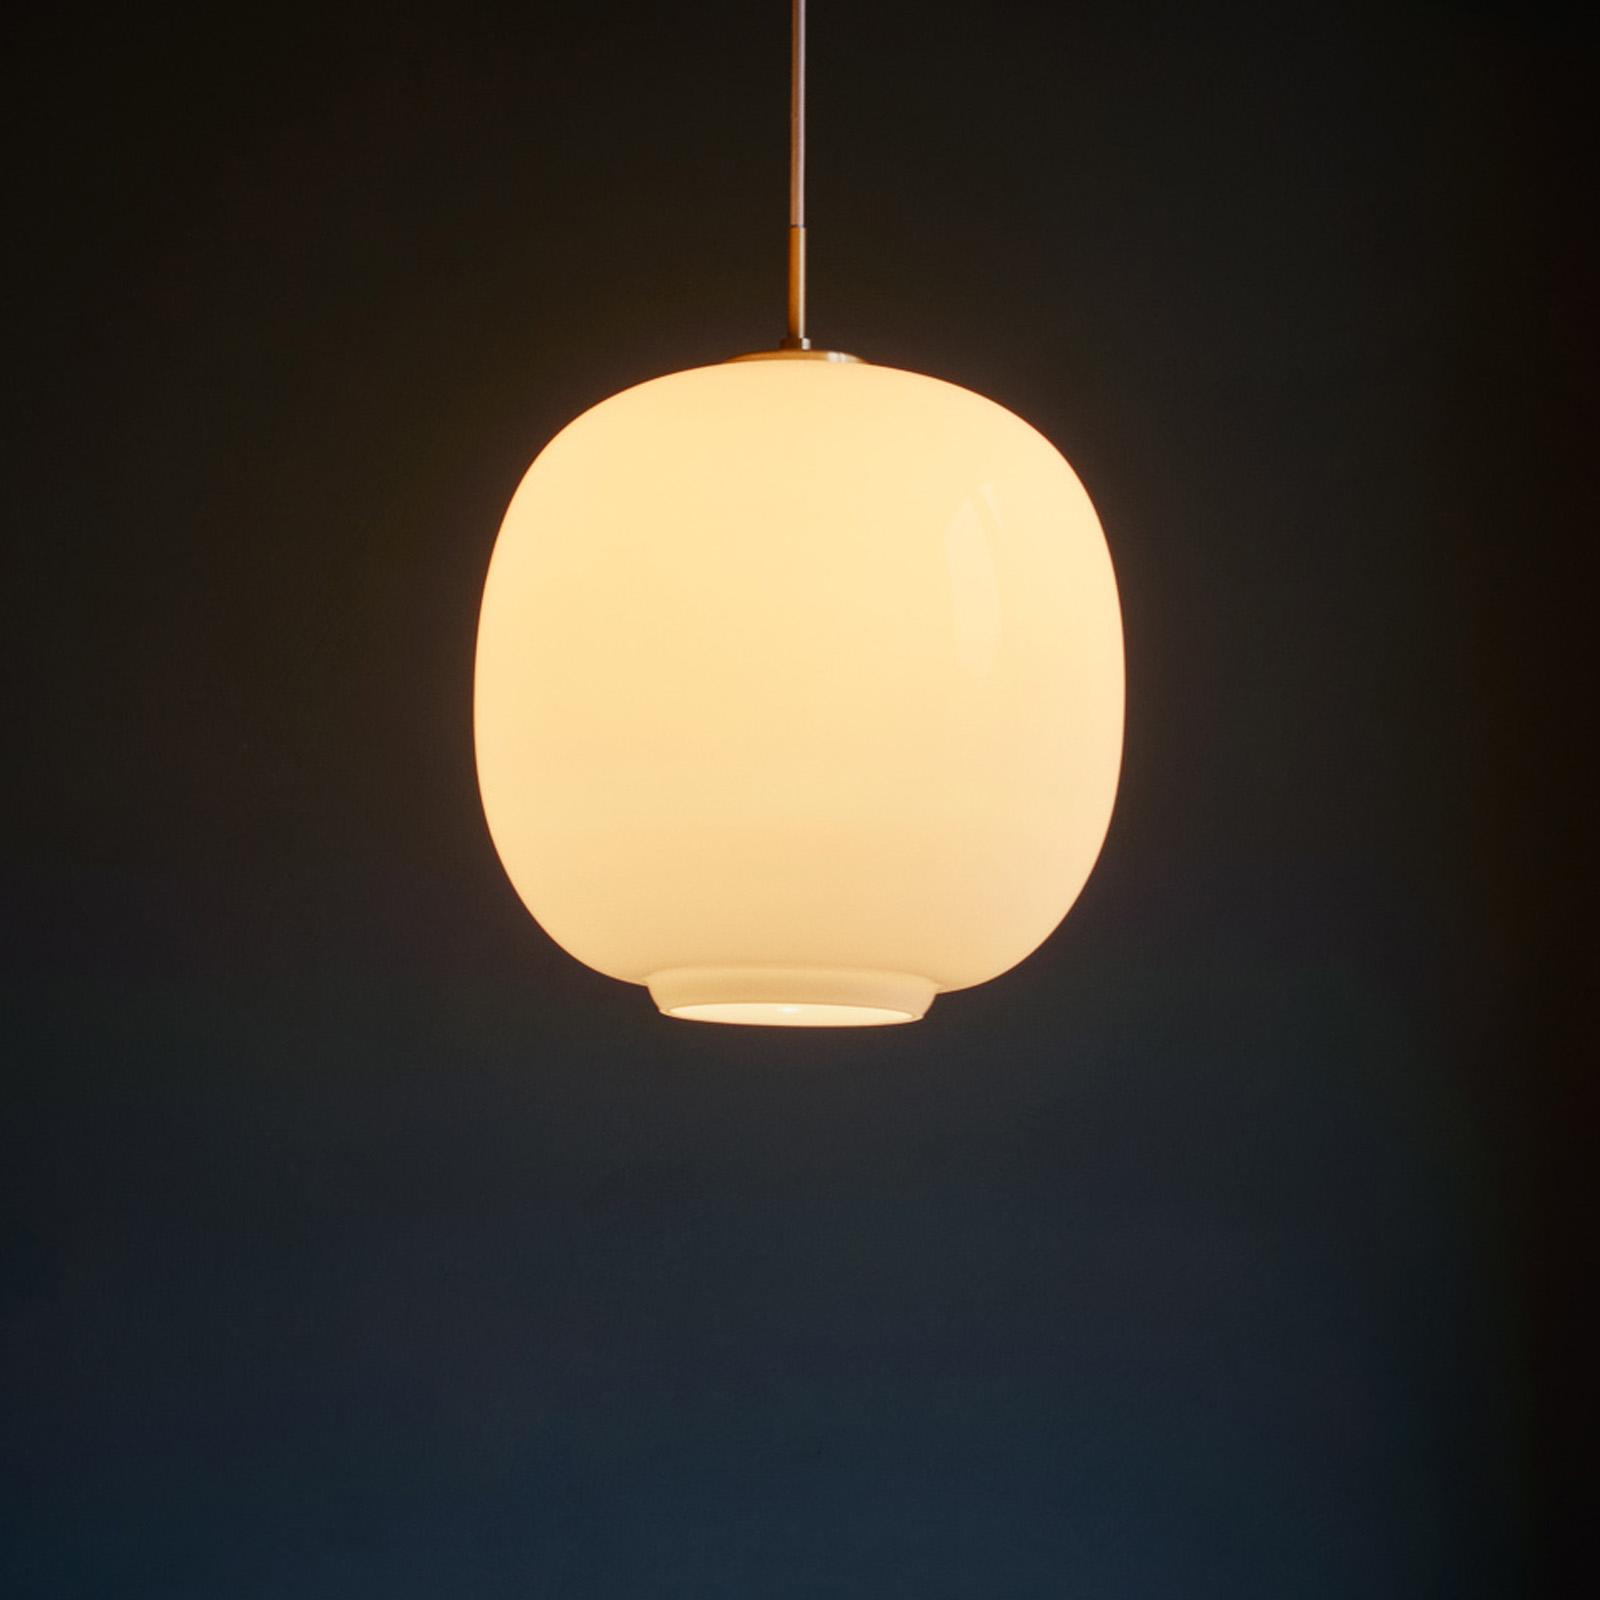 Louis Poulsen VL45 Radiohus hængelampe, 17,5 cm